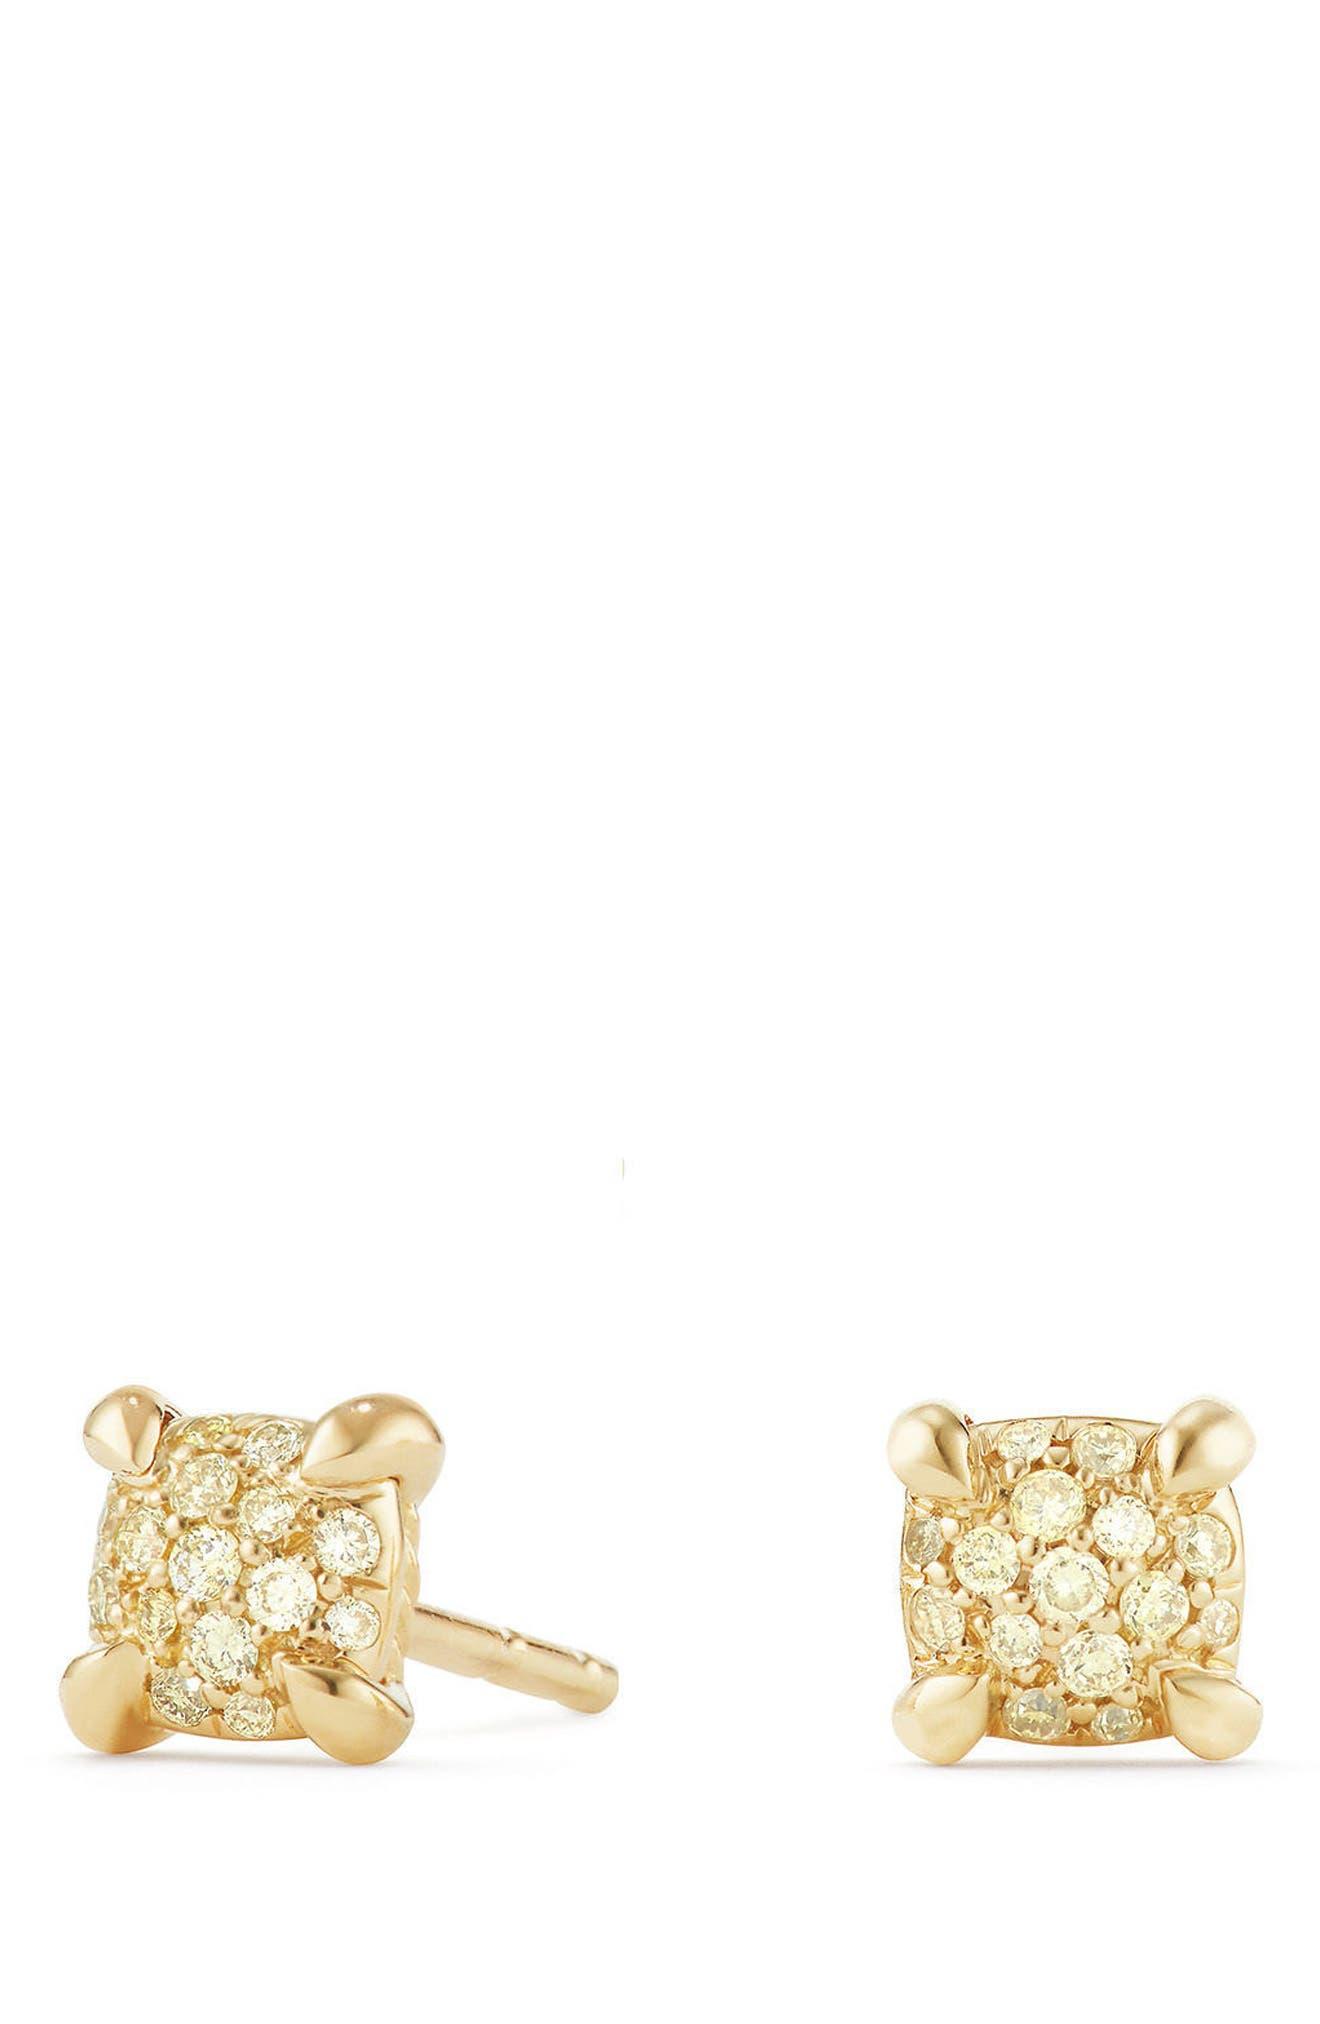 david yurman chtelaine stud earrings with diamonds